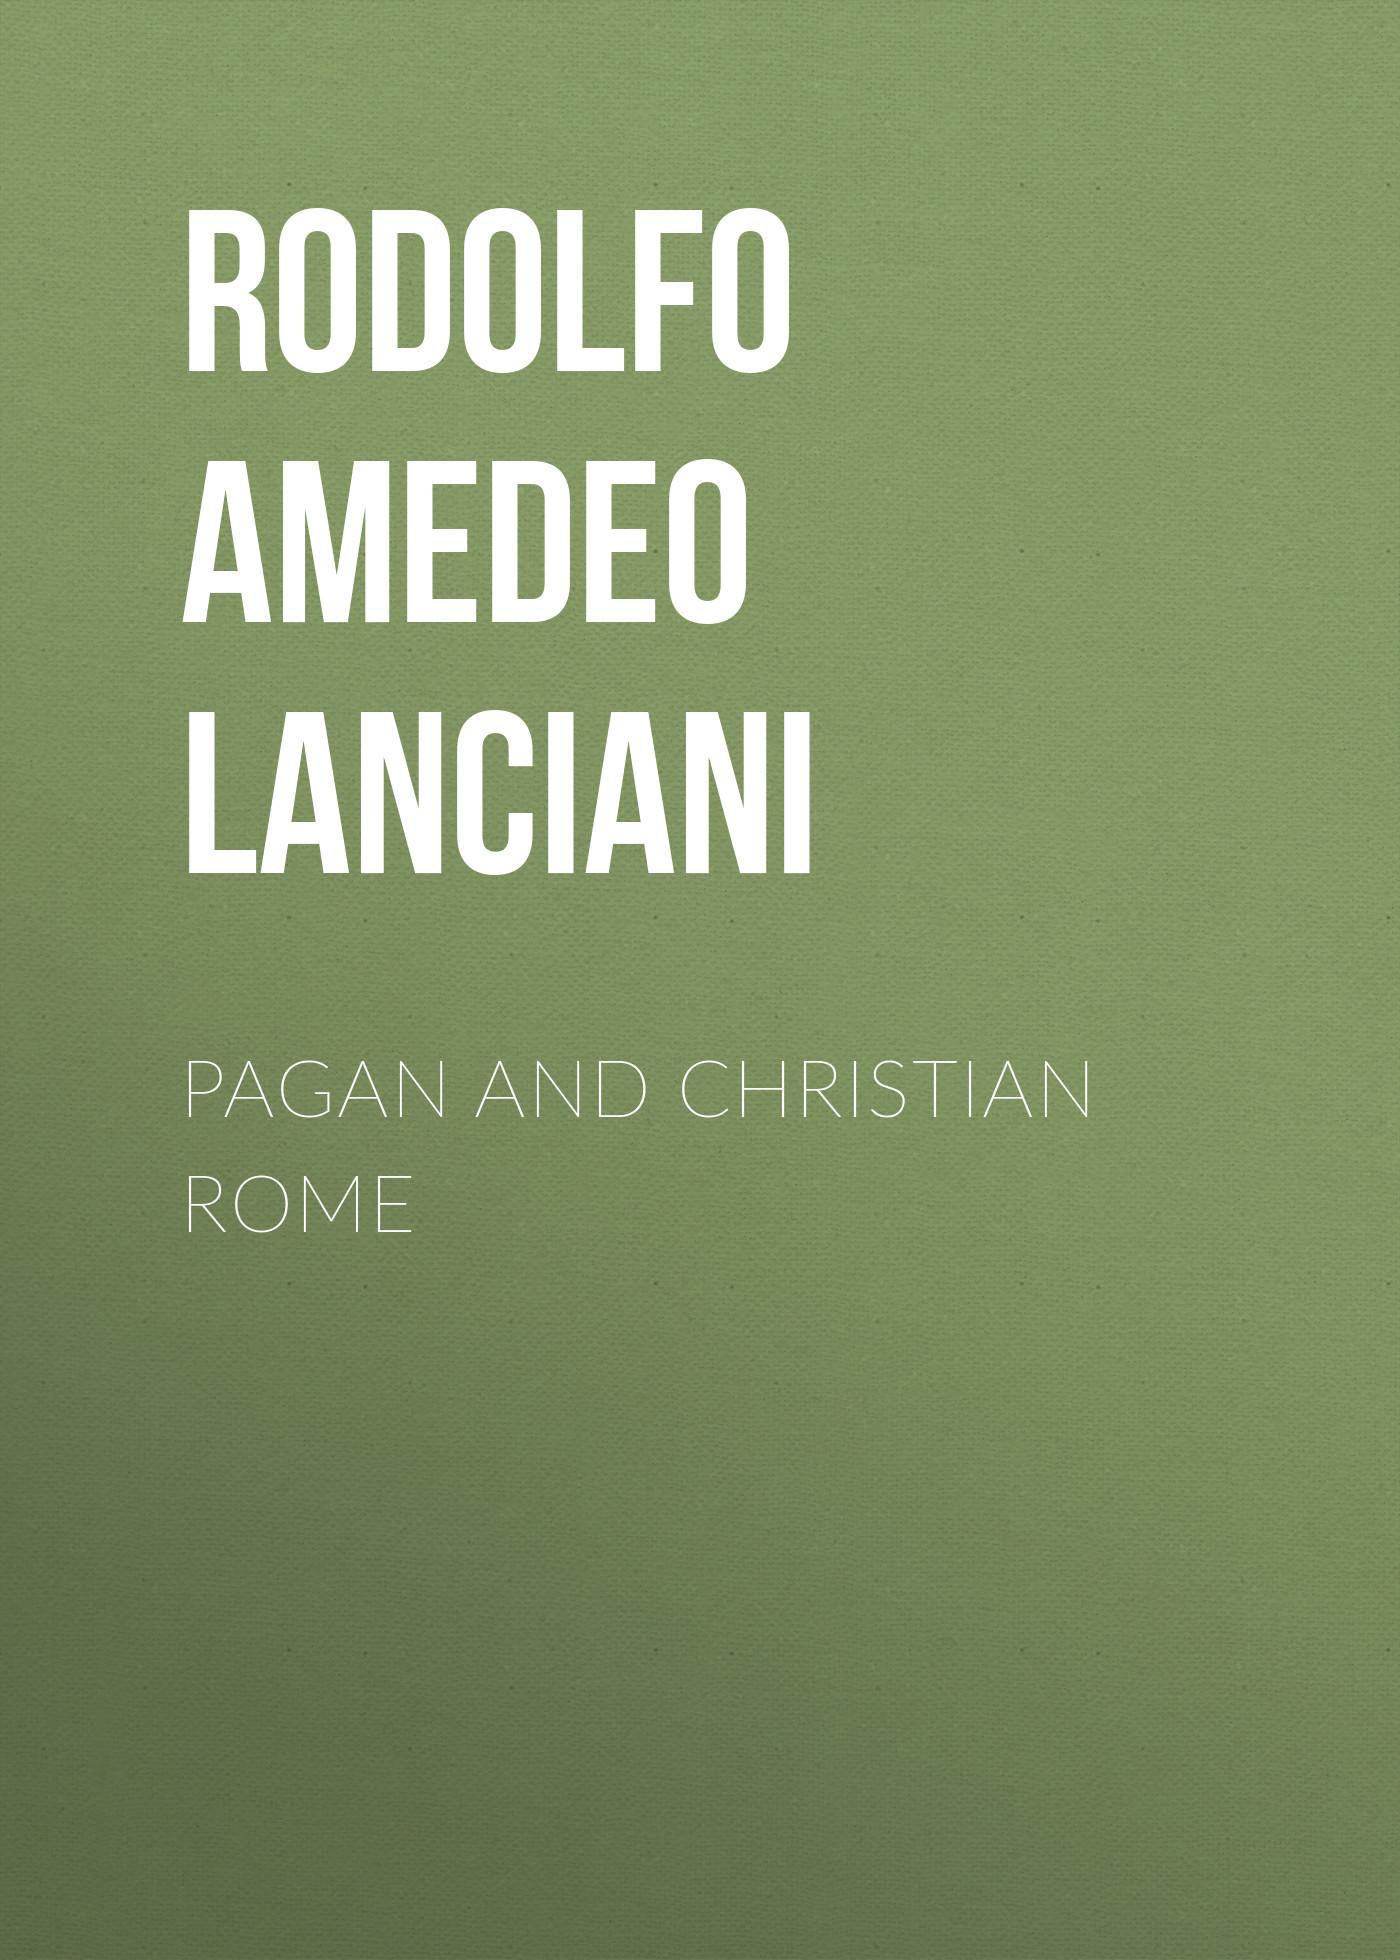 Rodolfo Amedeo Lanciani Pagan and Christian Rome dodds pagan